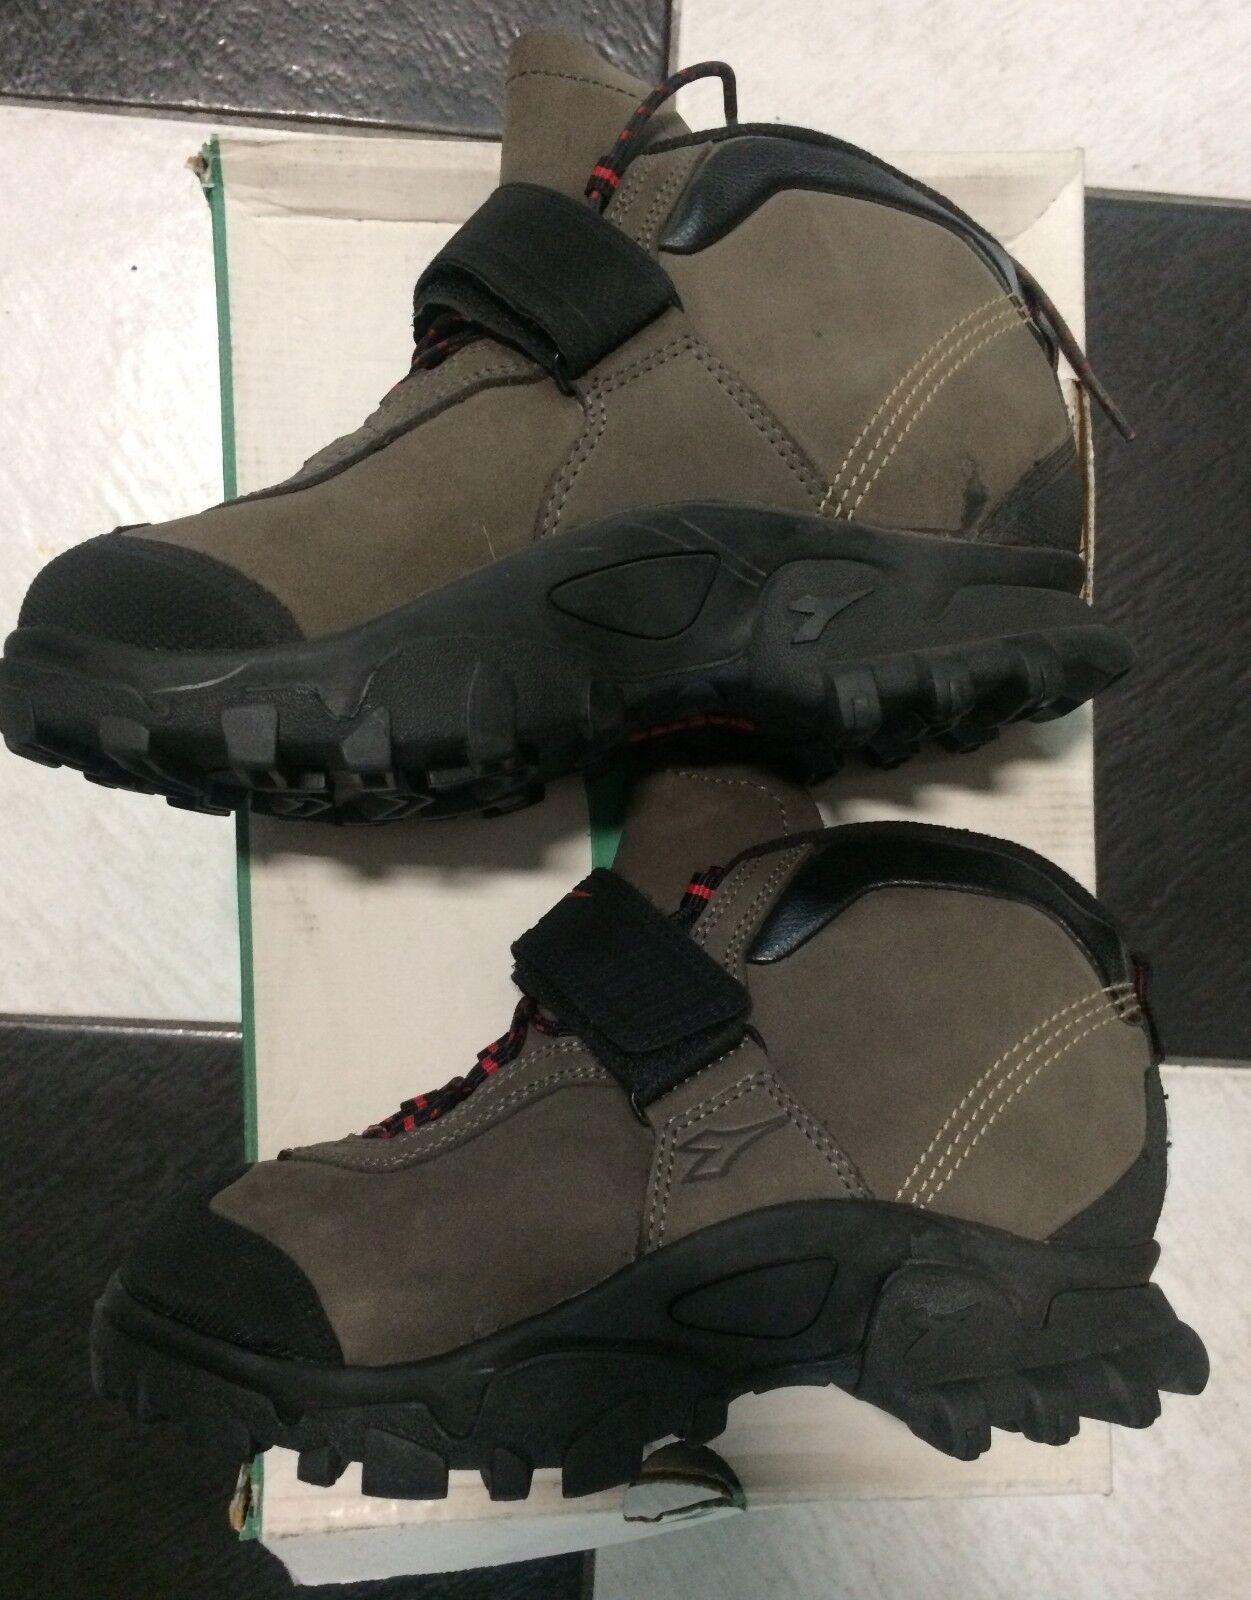 Schuhe Anti Fahrräder 37 schuhe Proof Regen Stiefel Hydro